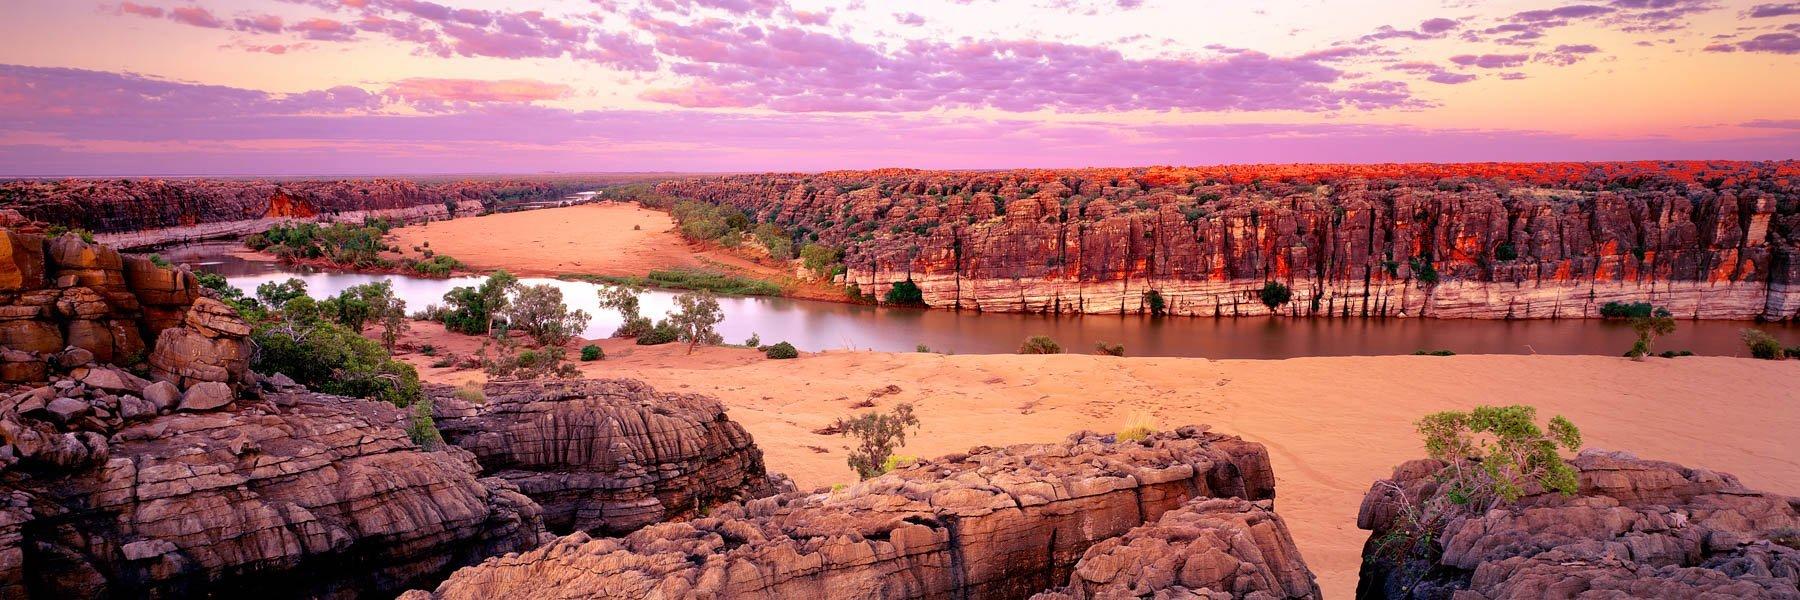 A pastel sunrise over Geikie Gorge, Kimberley, WA, Australia.